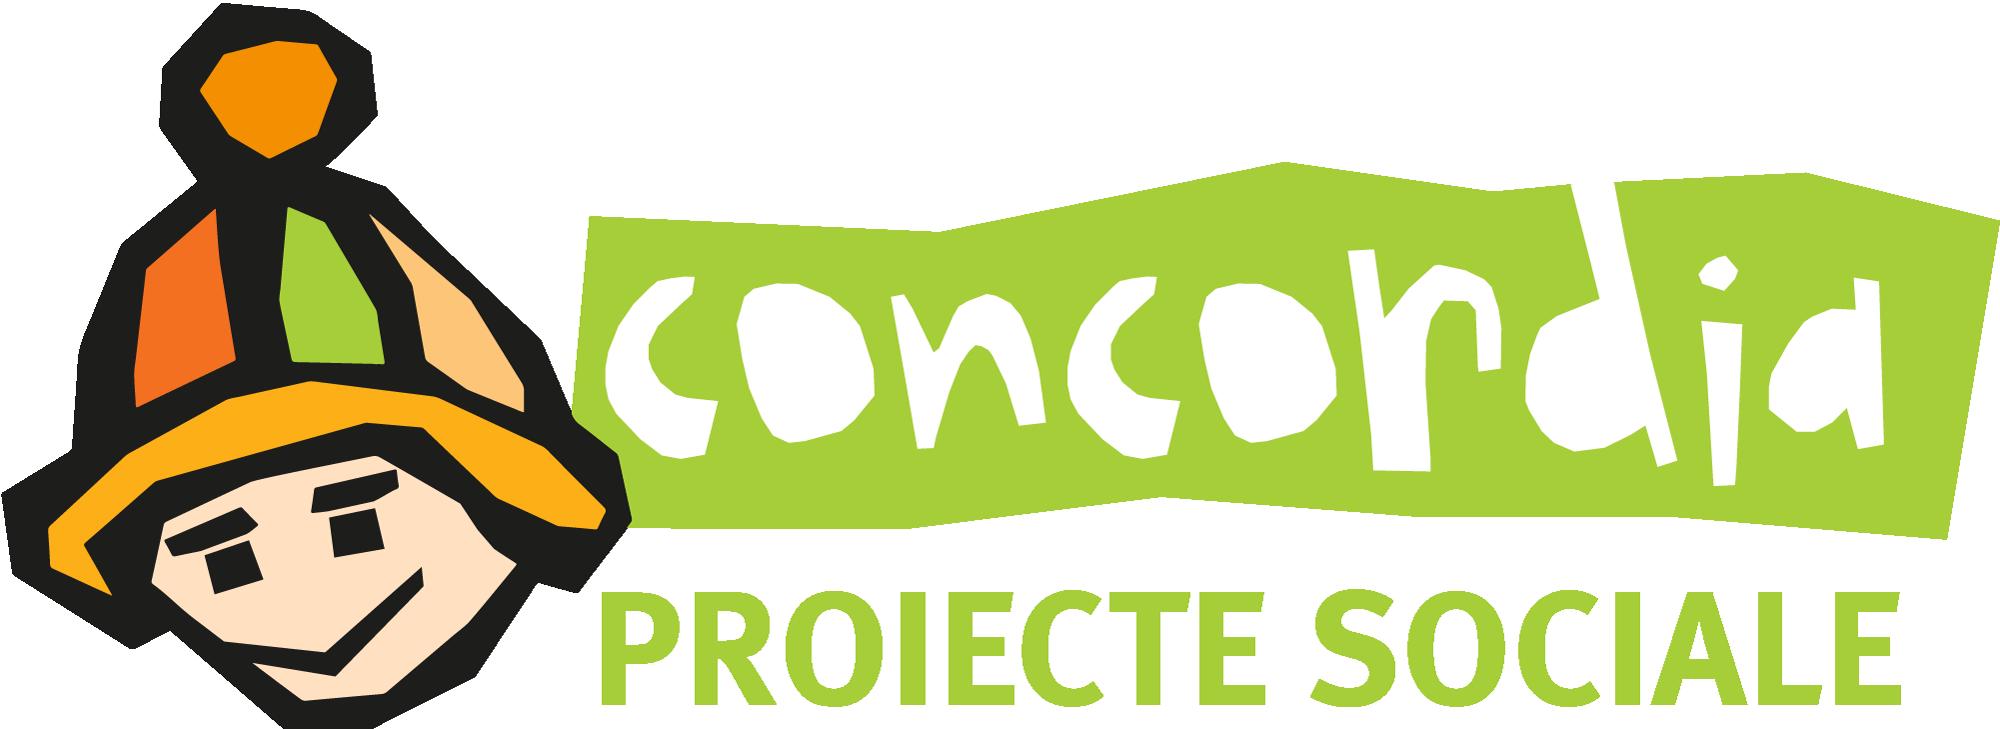 Organizația Umanitară CONCORDIA logo